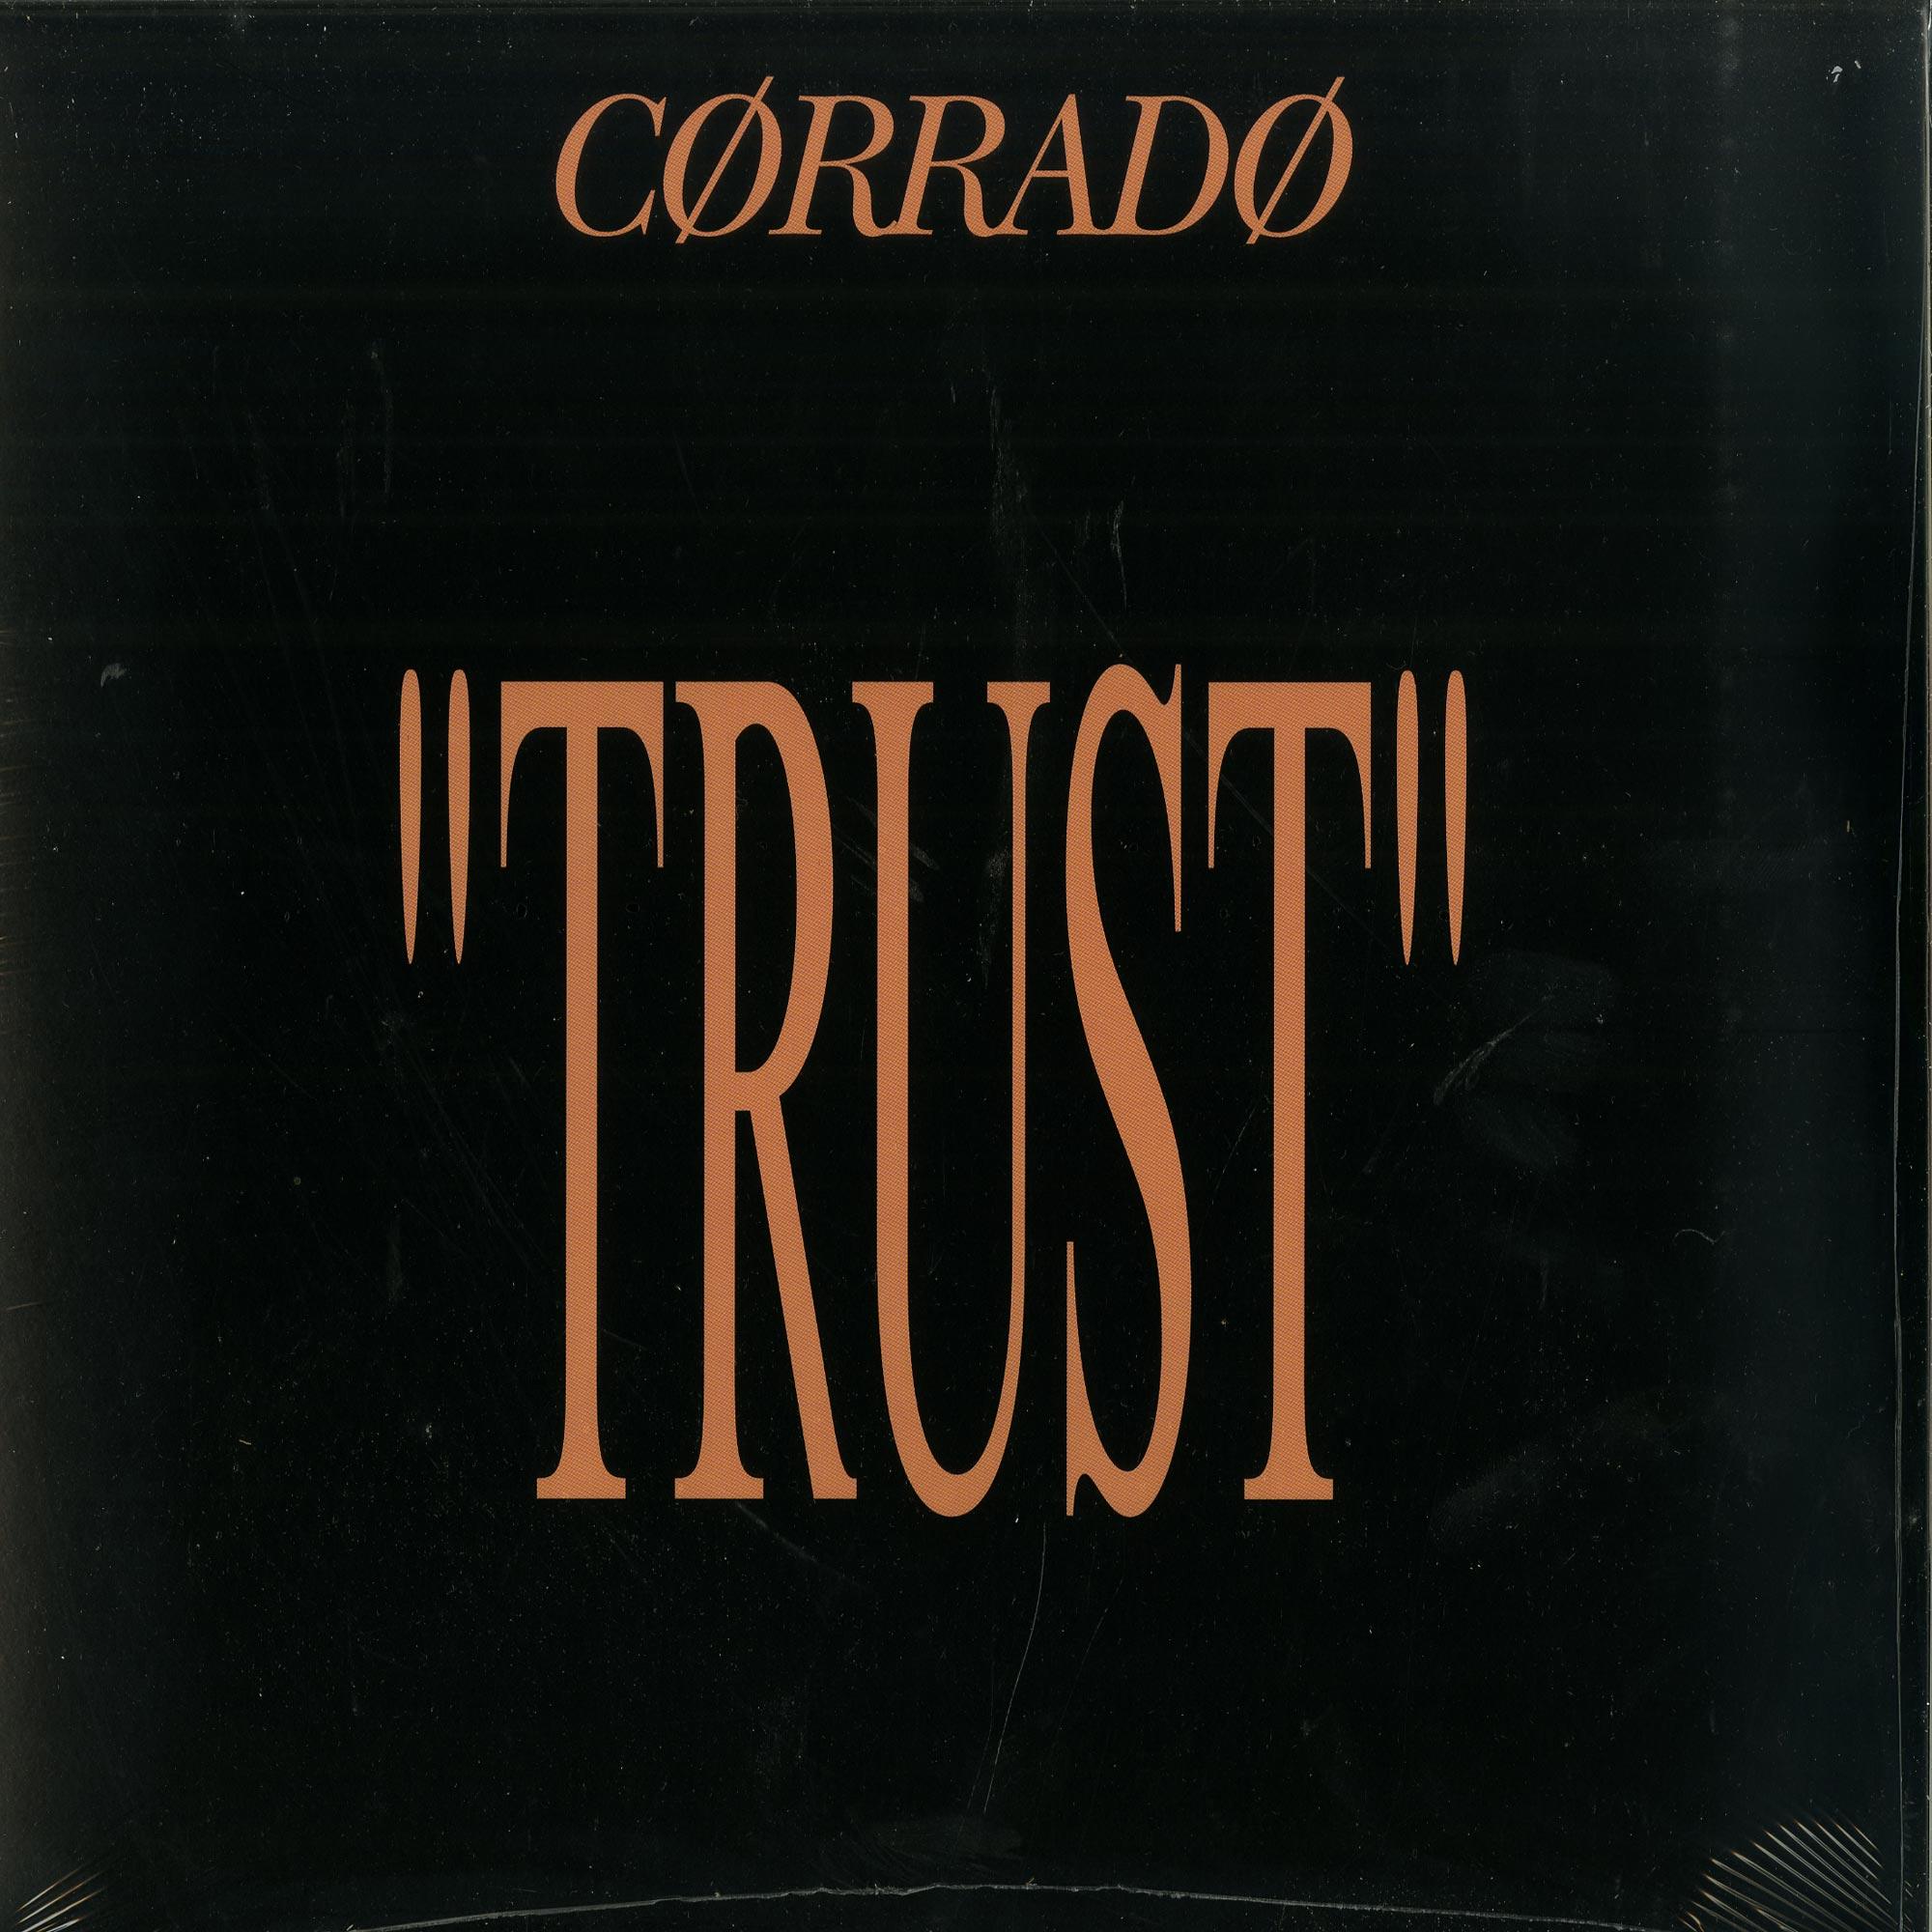 Corrado - TRUST